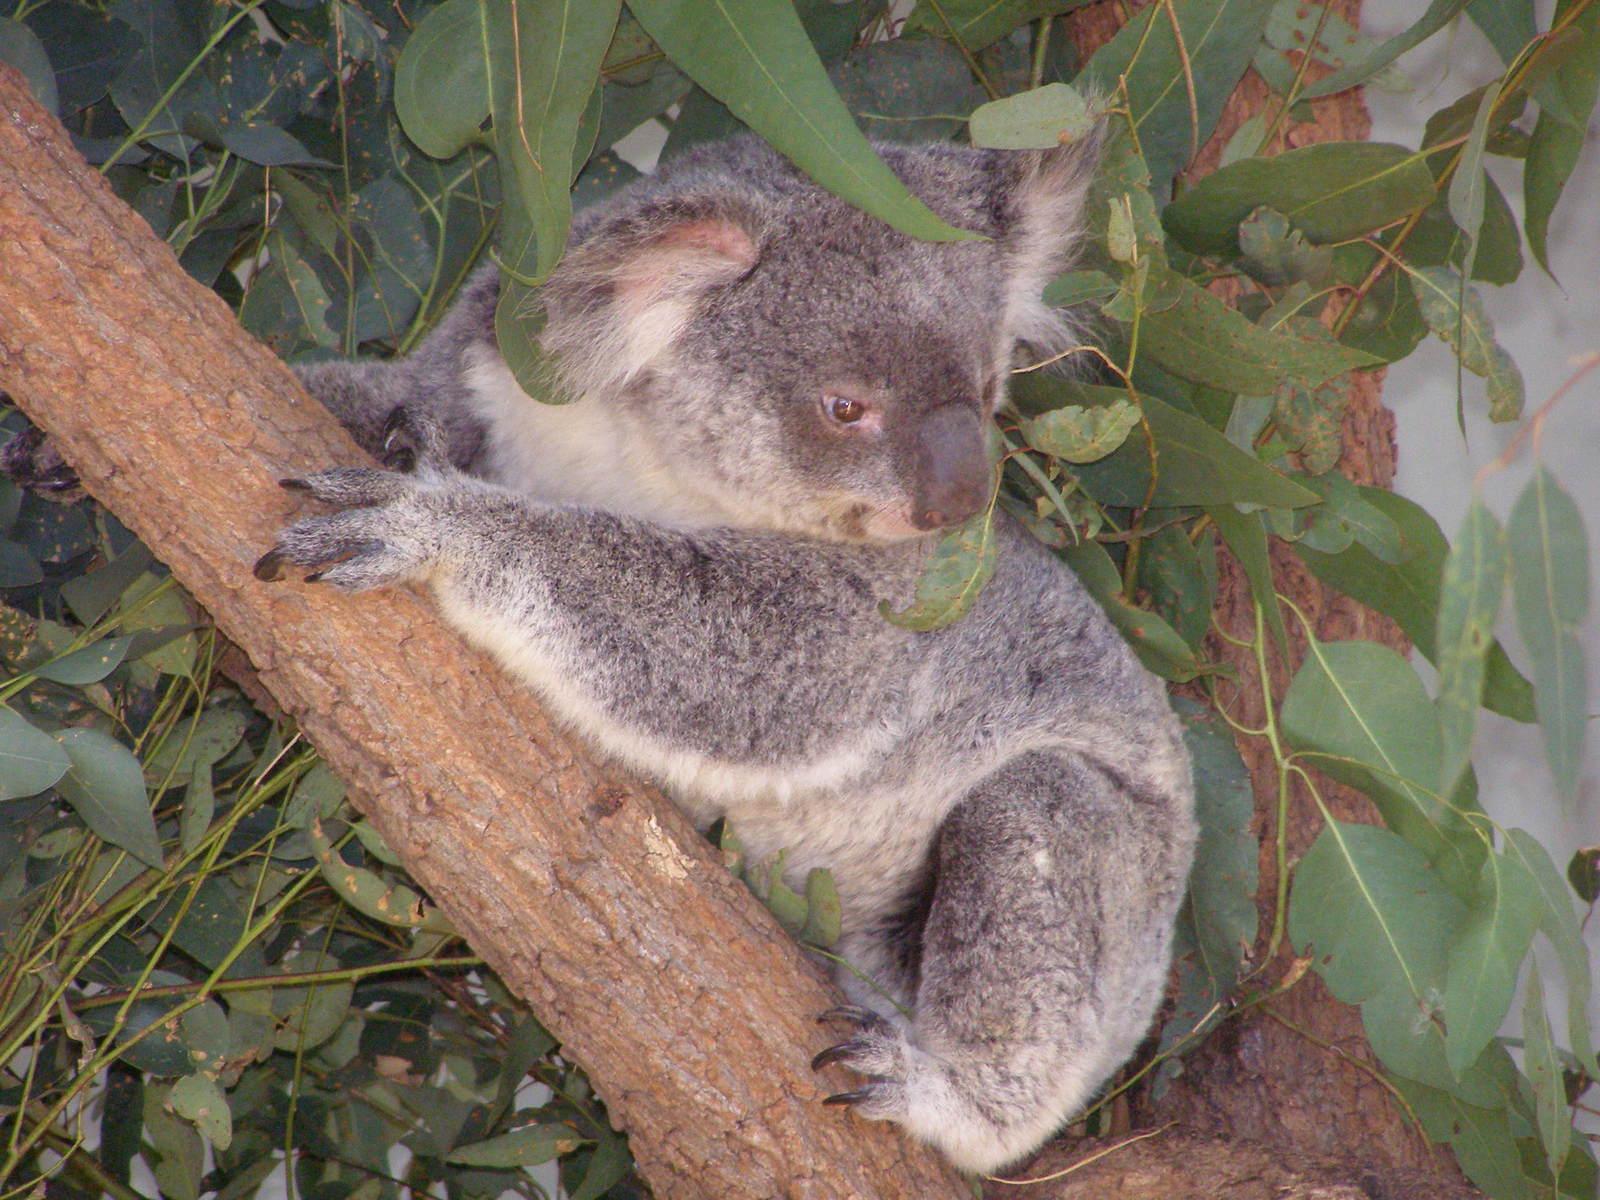 free 树袋熊,塔隆加动物园, 悉尼澳大利亚 stock photo